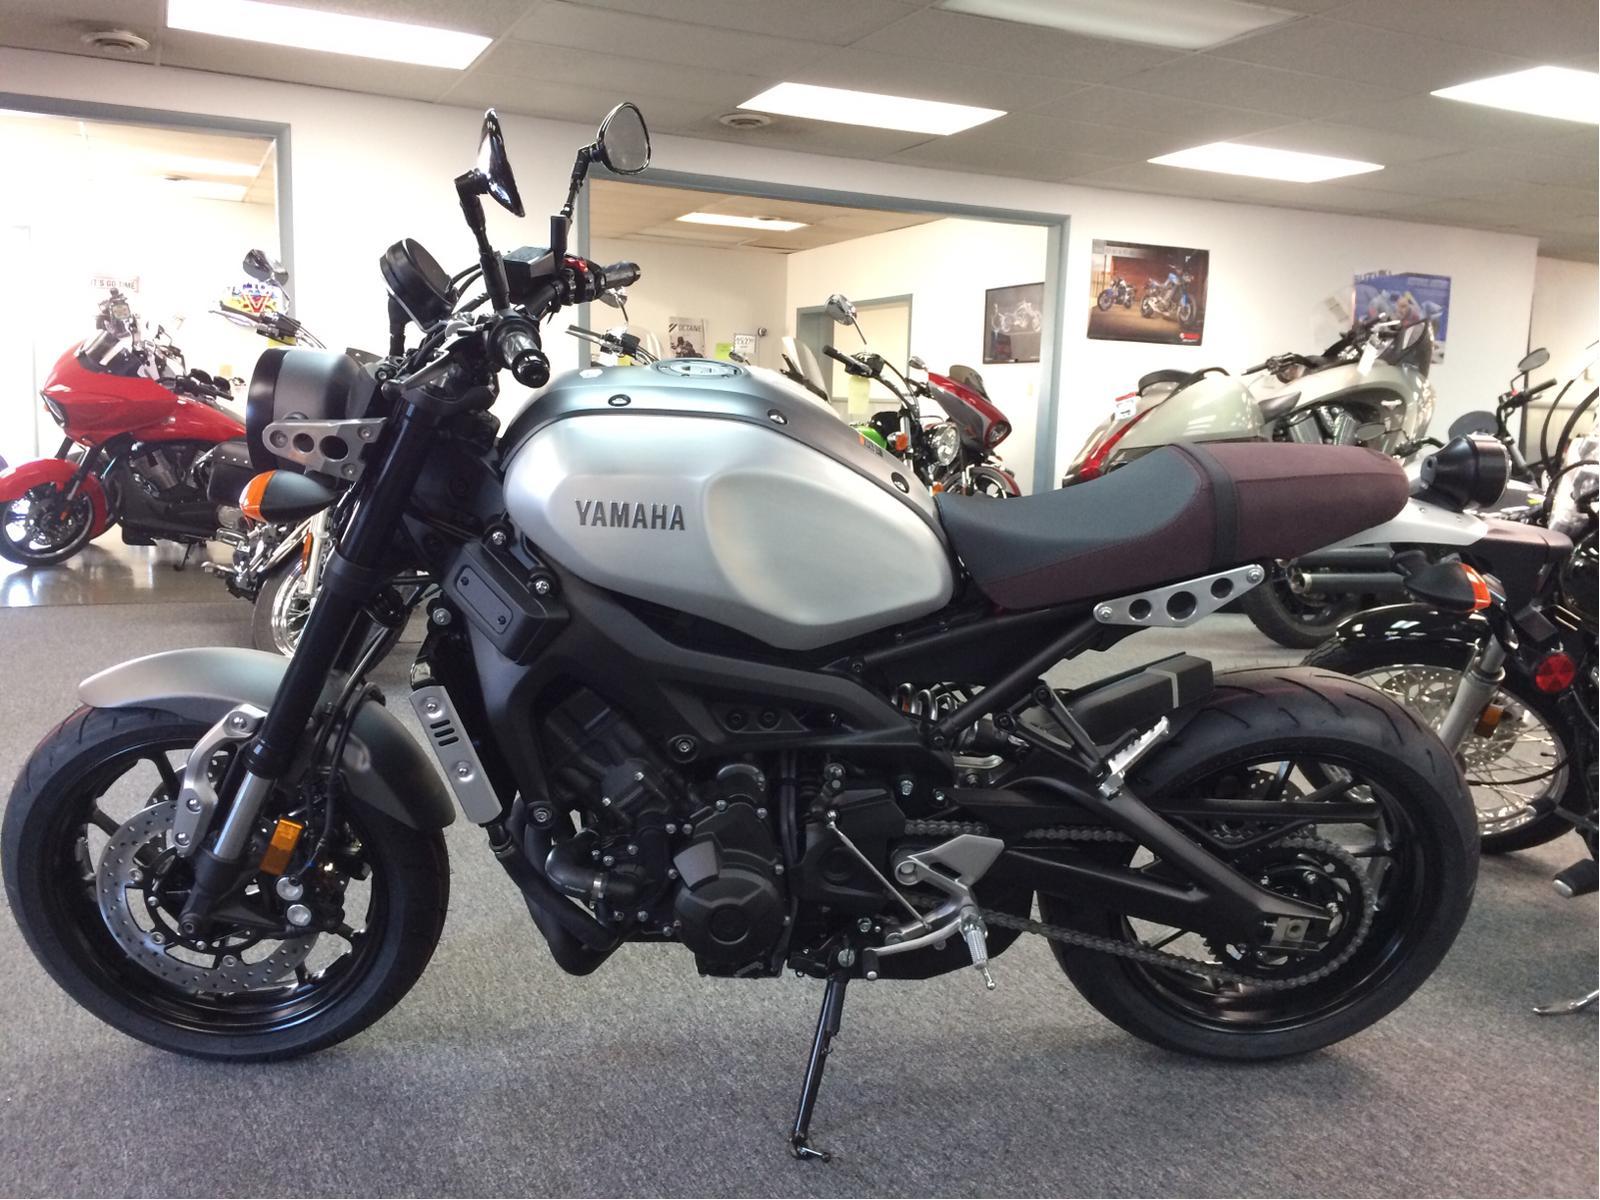 2016 Yamaha XSR 900 For Sale In Urbana IL Sportland Motorsports